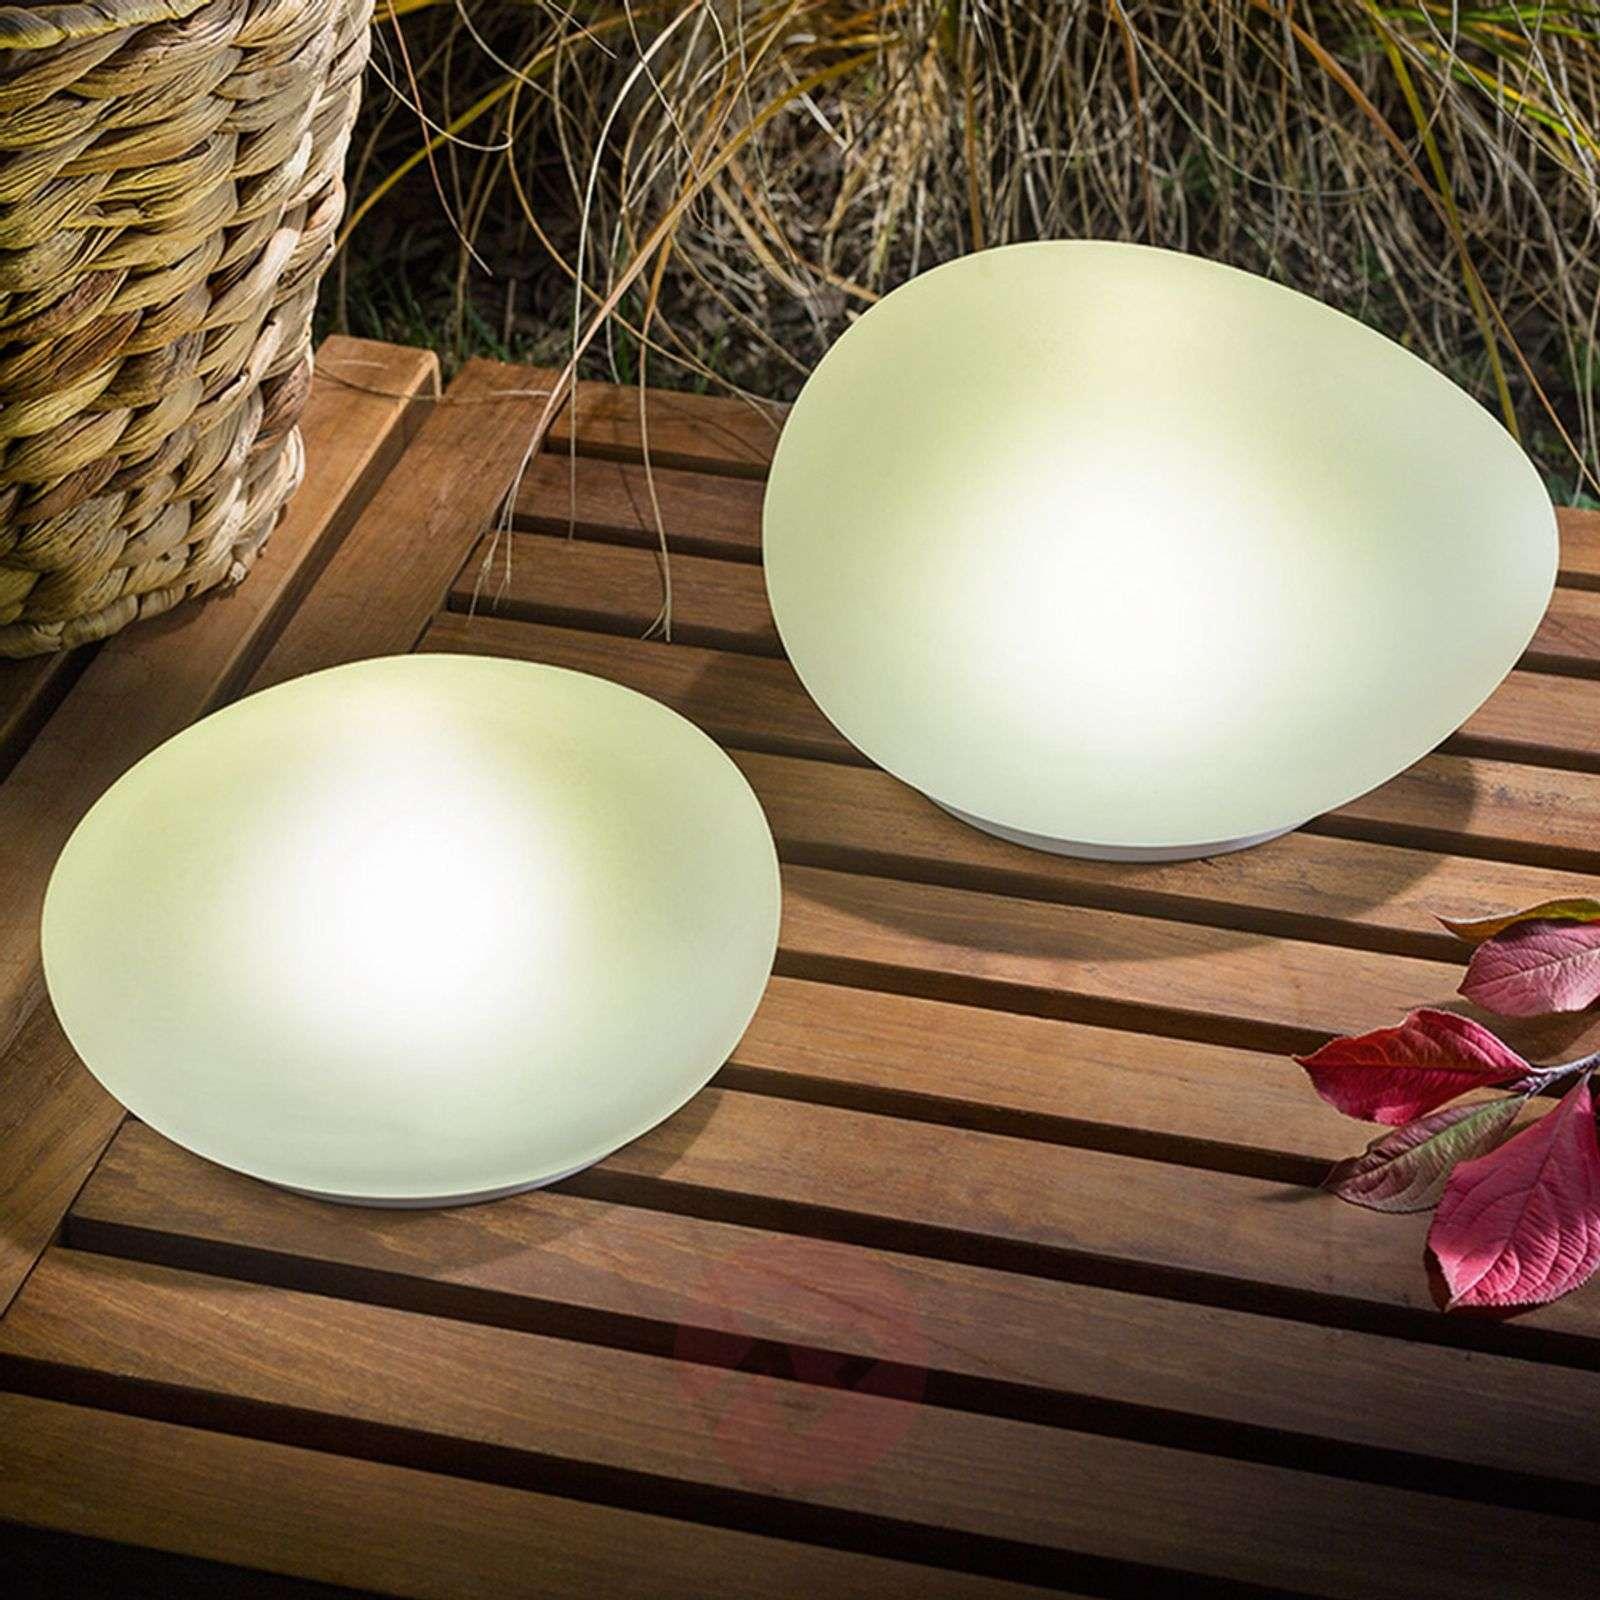 Solar-powered LED deco stones Flintstone set of 2-3012539-01